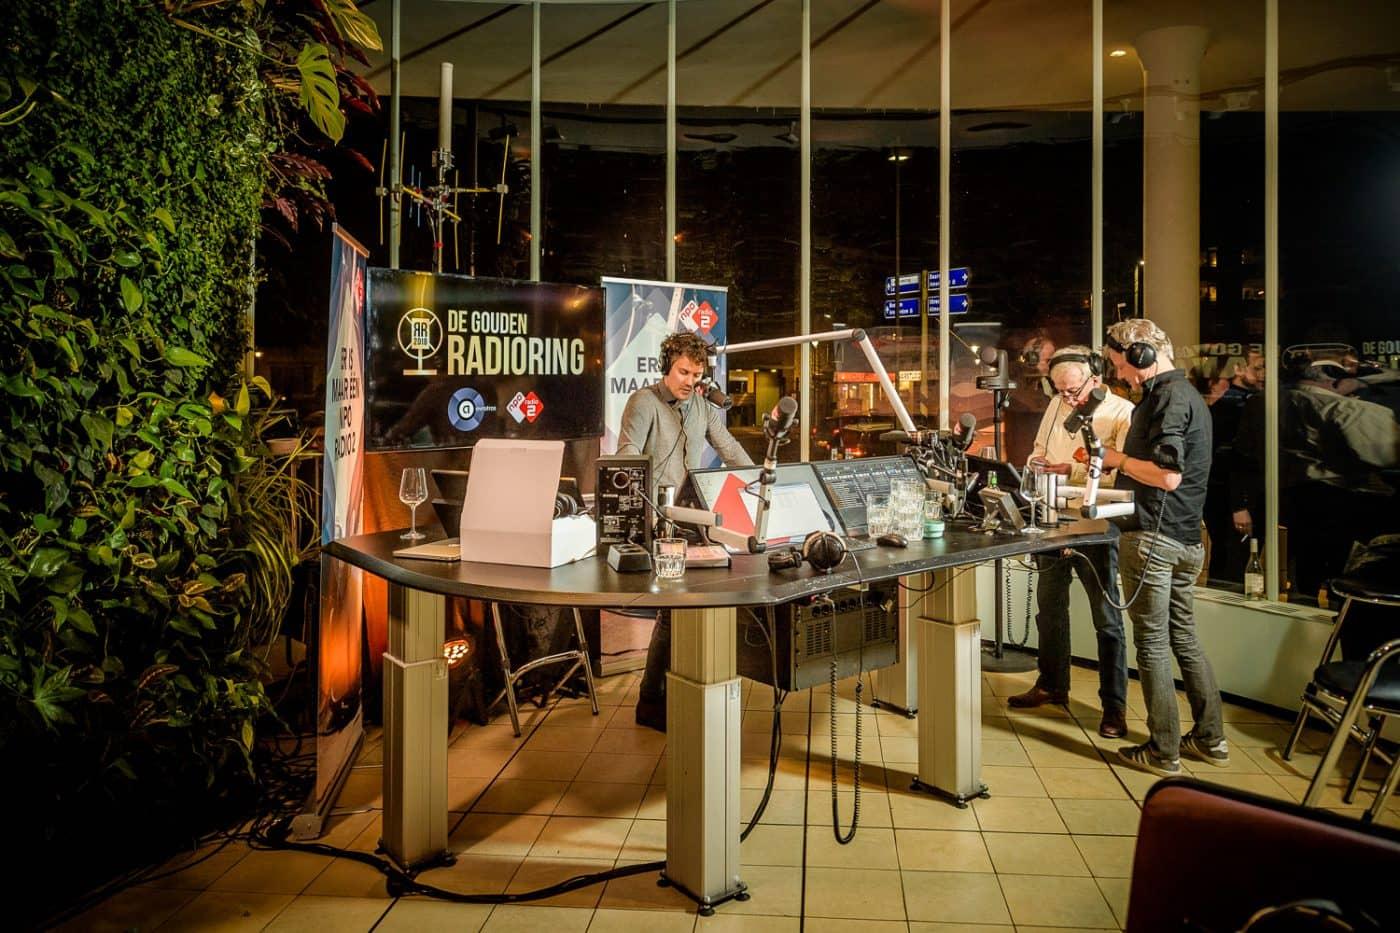 RadioRIng Studio in The Copper Bar Gooiland